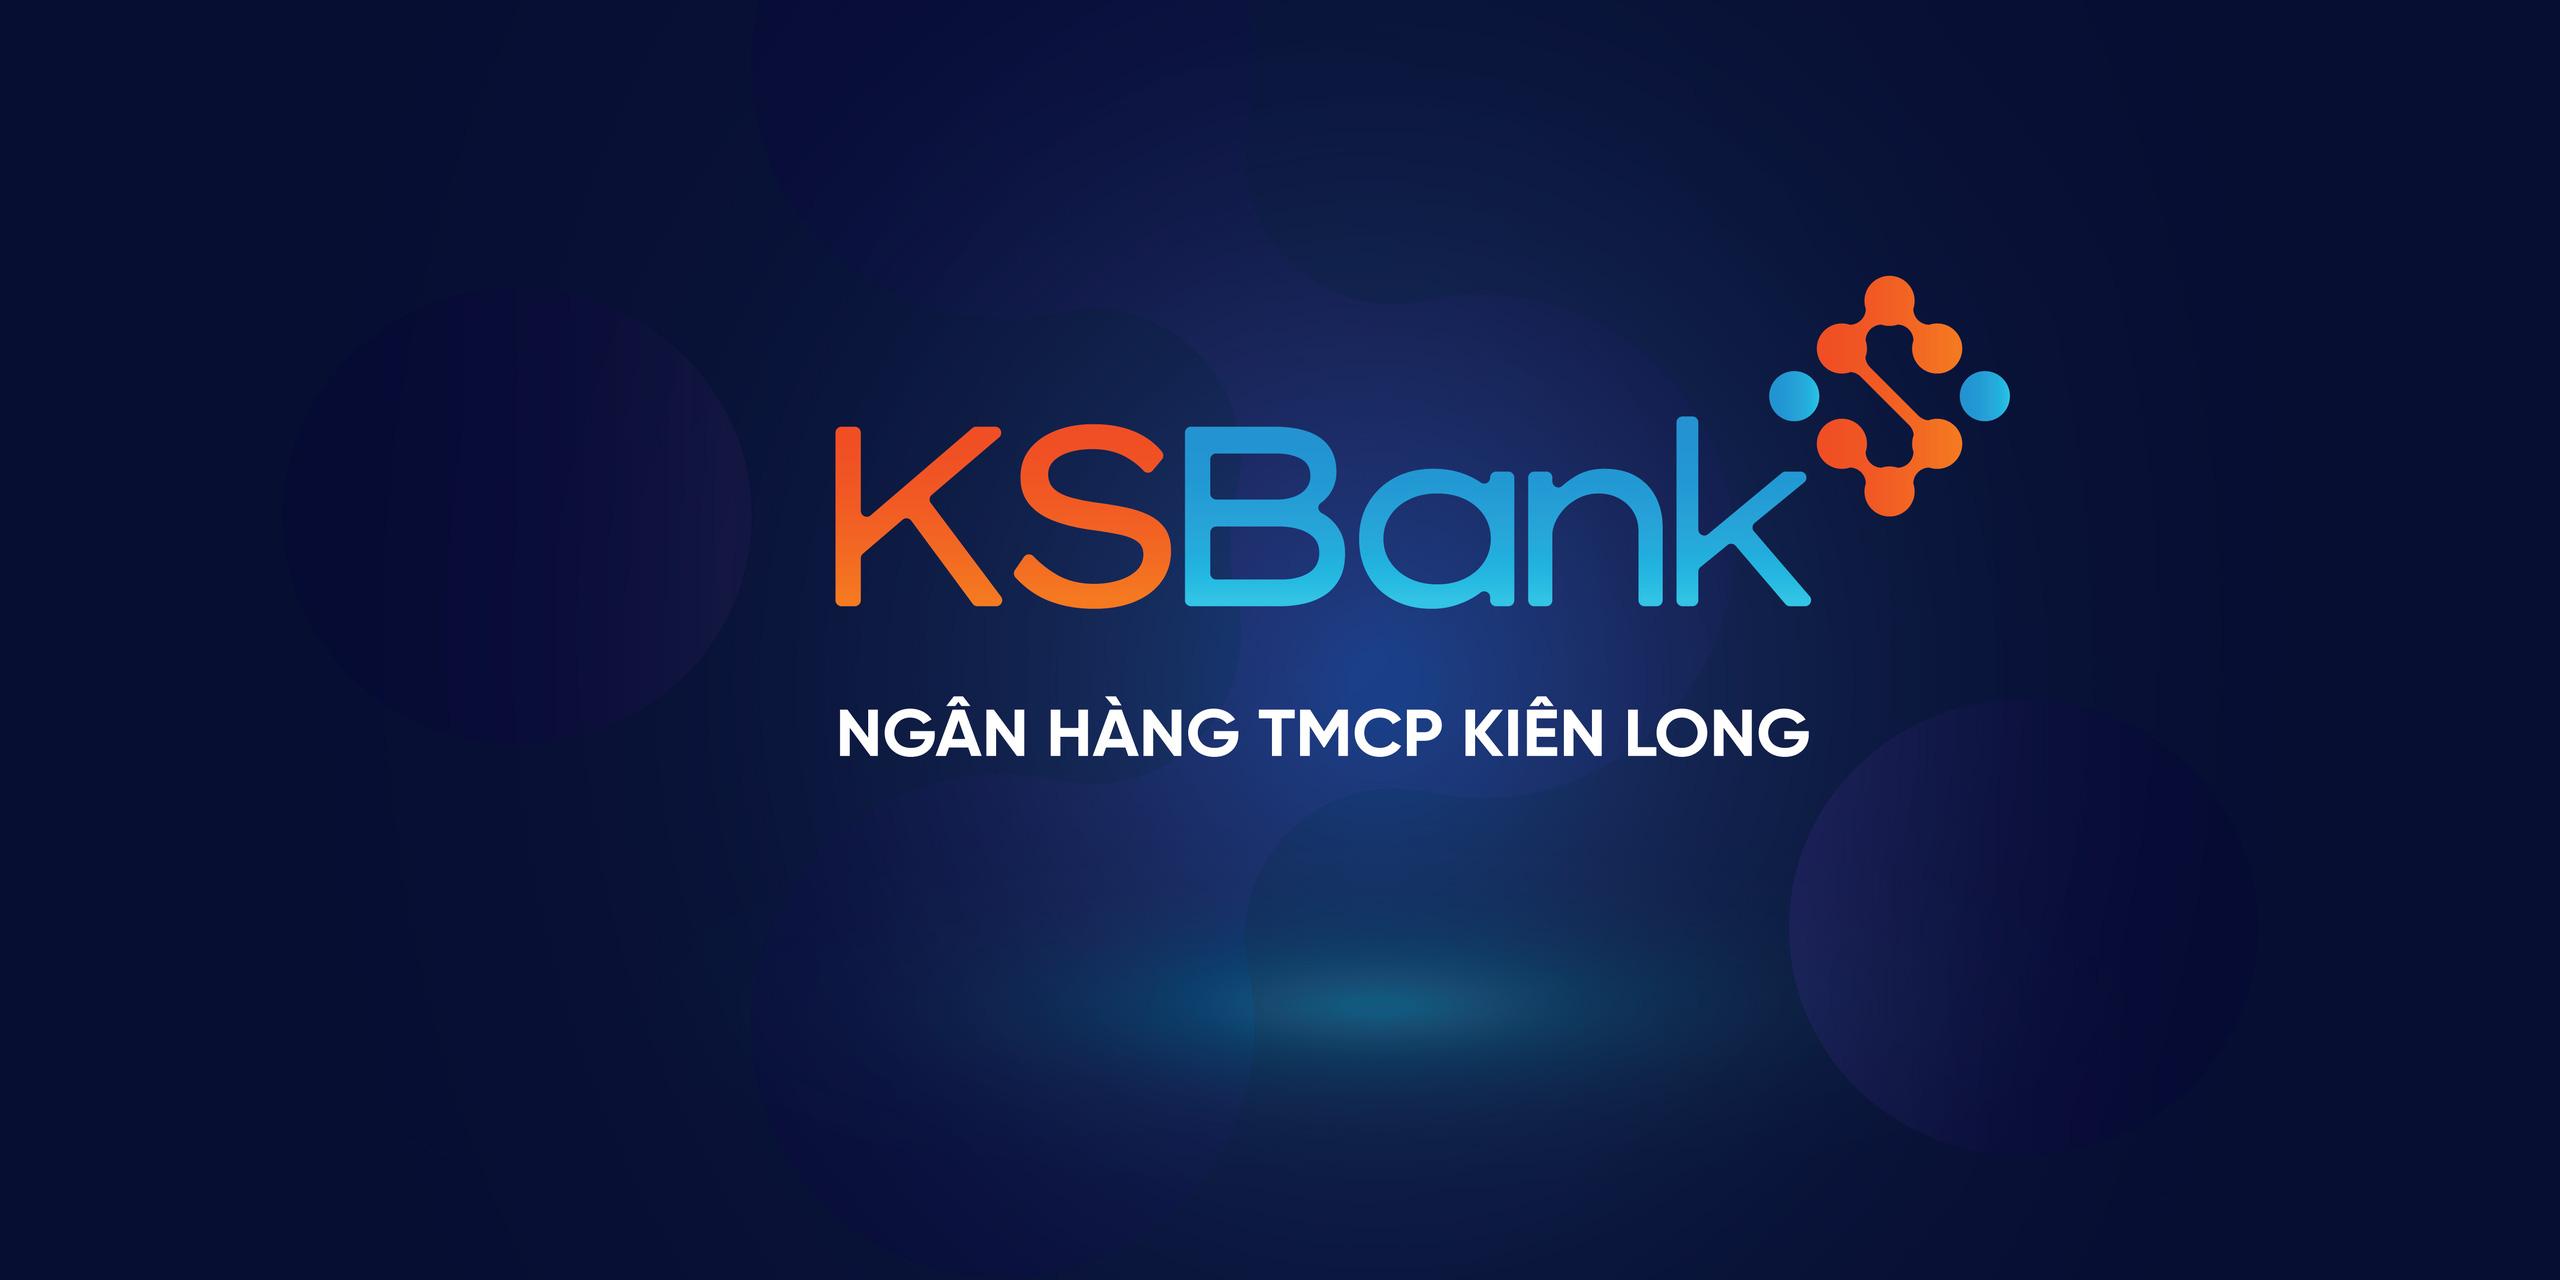 Kienlongbank (KSBank) bầu Chủ tịch HĐQT mới - Ảnh 2.